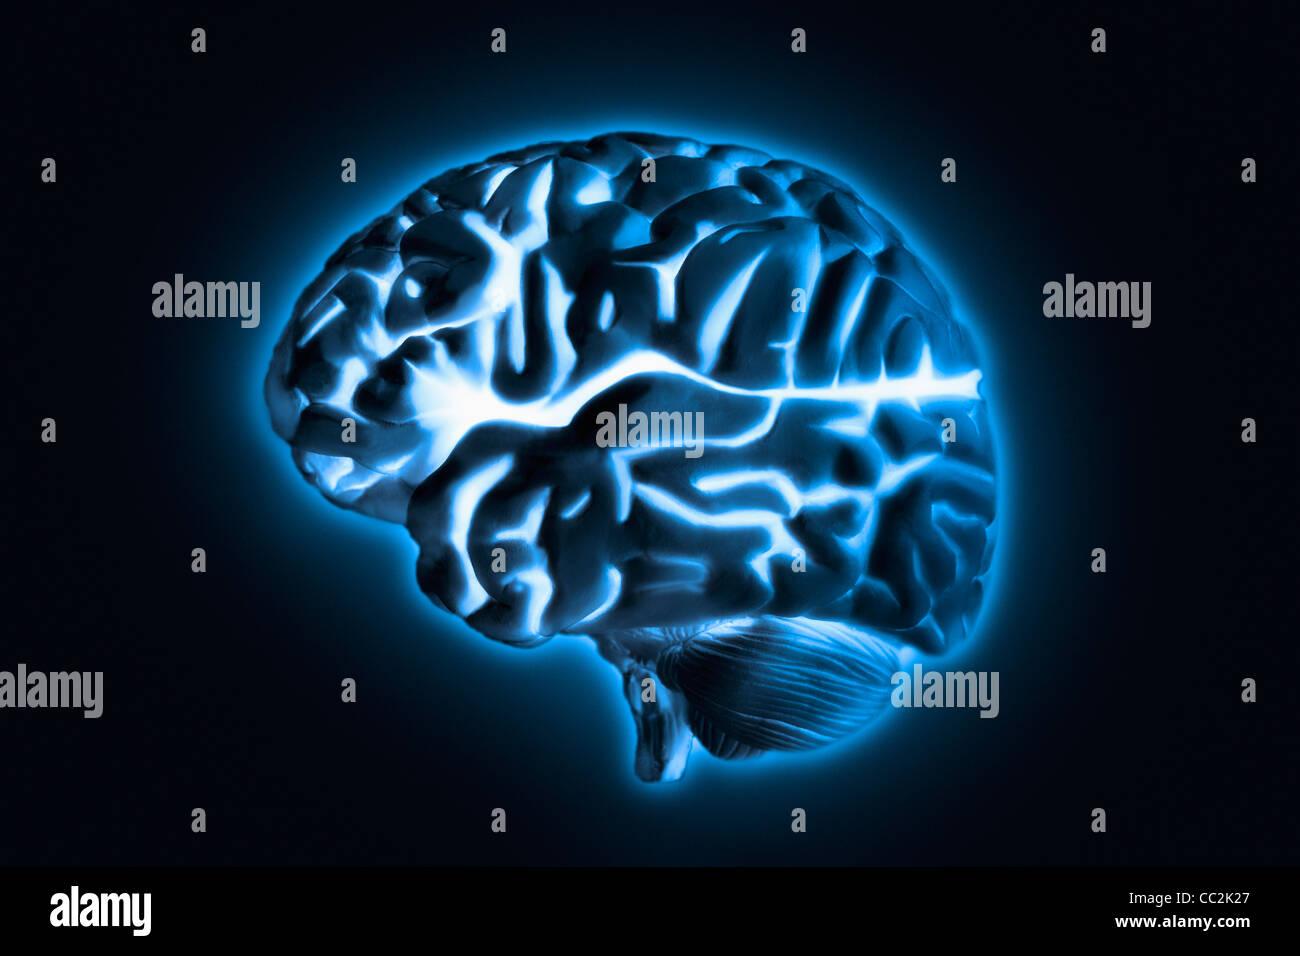 Human brain model with blue glow, studio shot - Stock Image